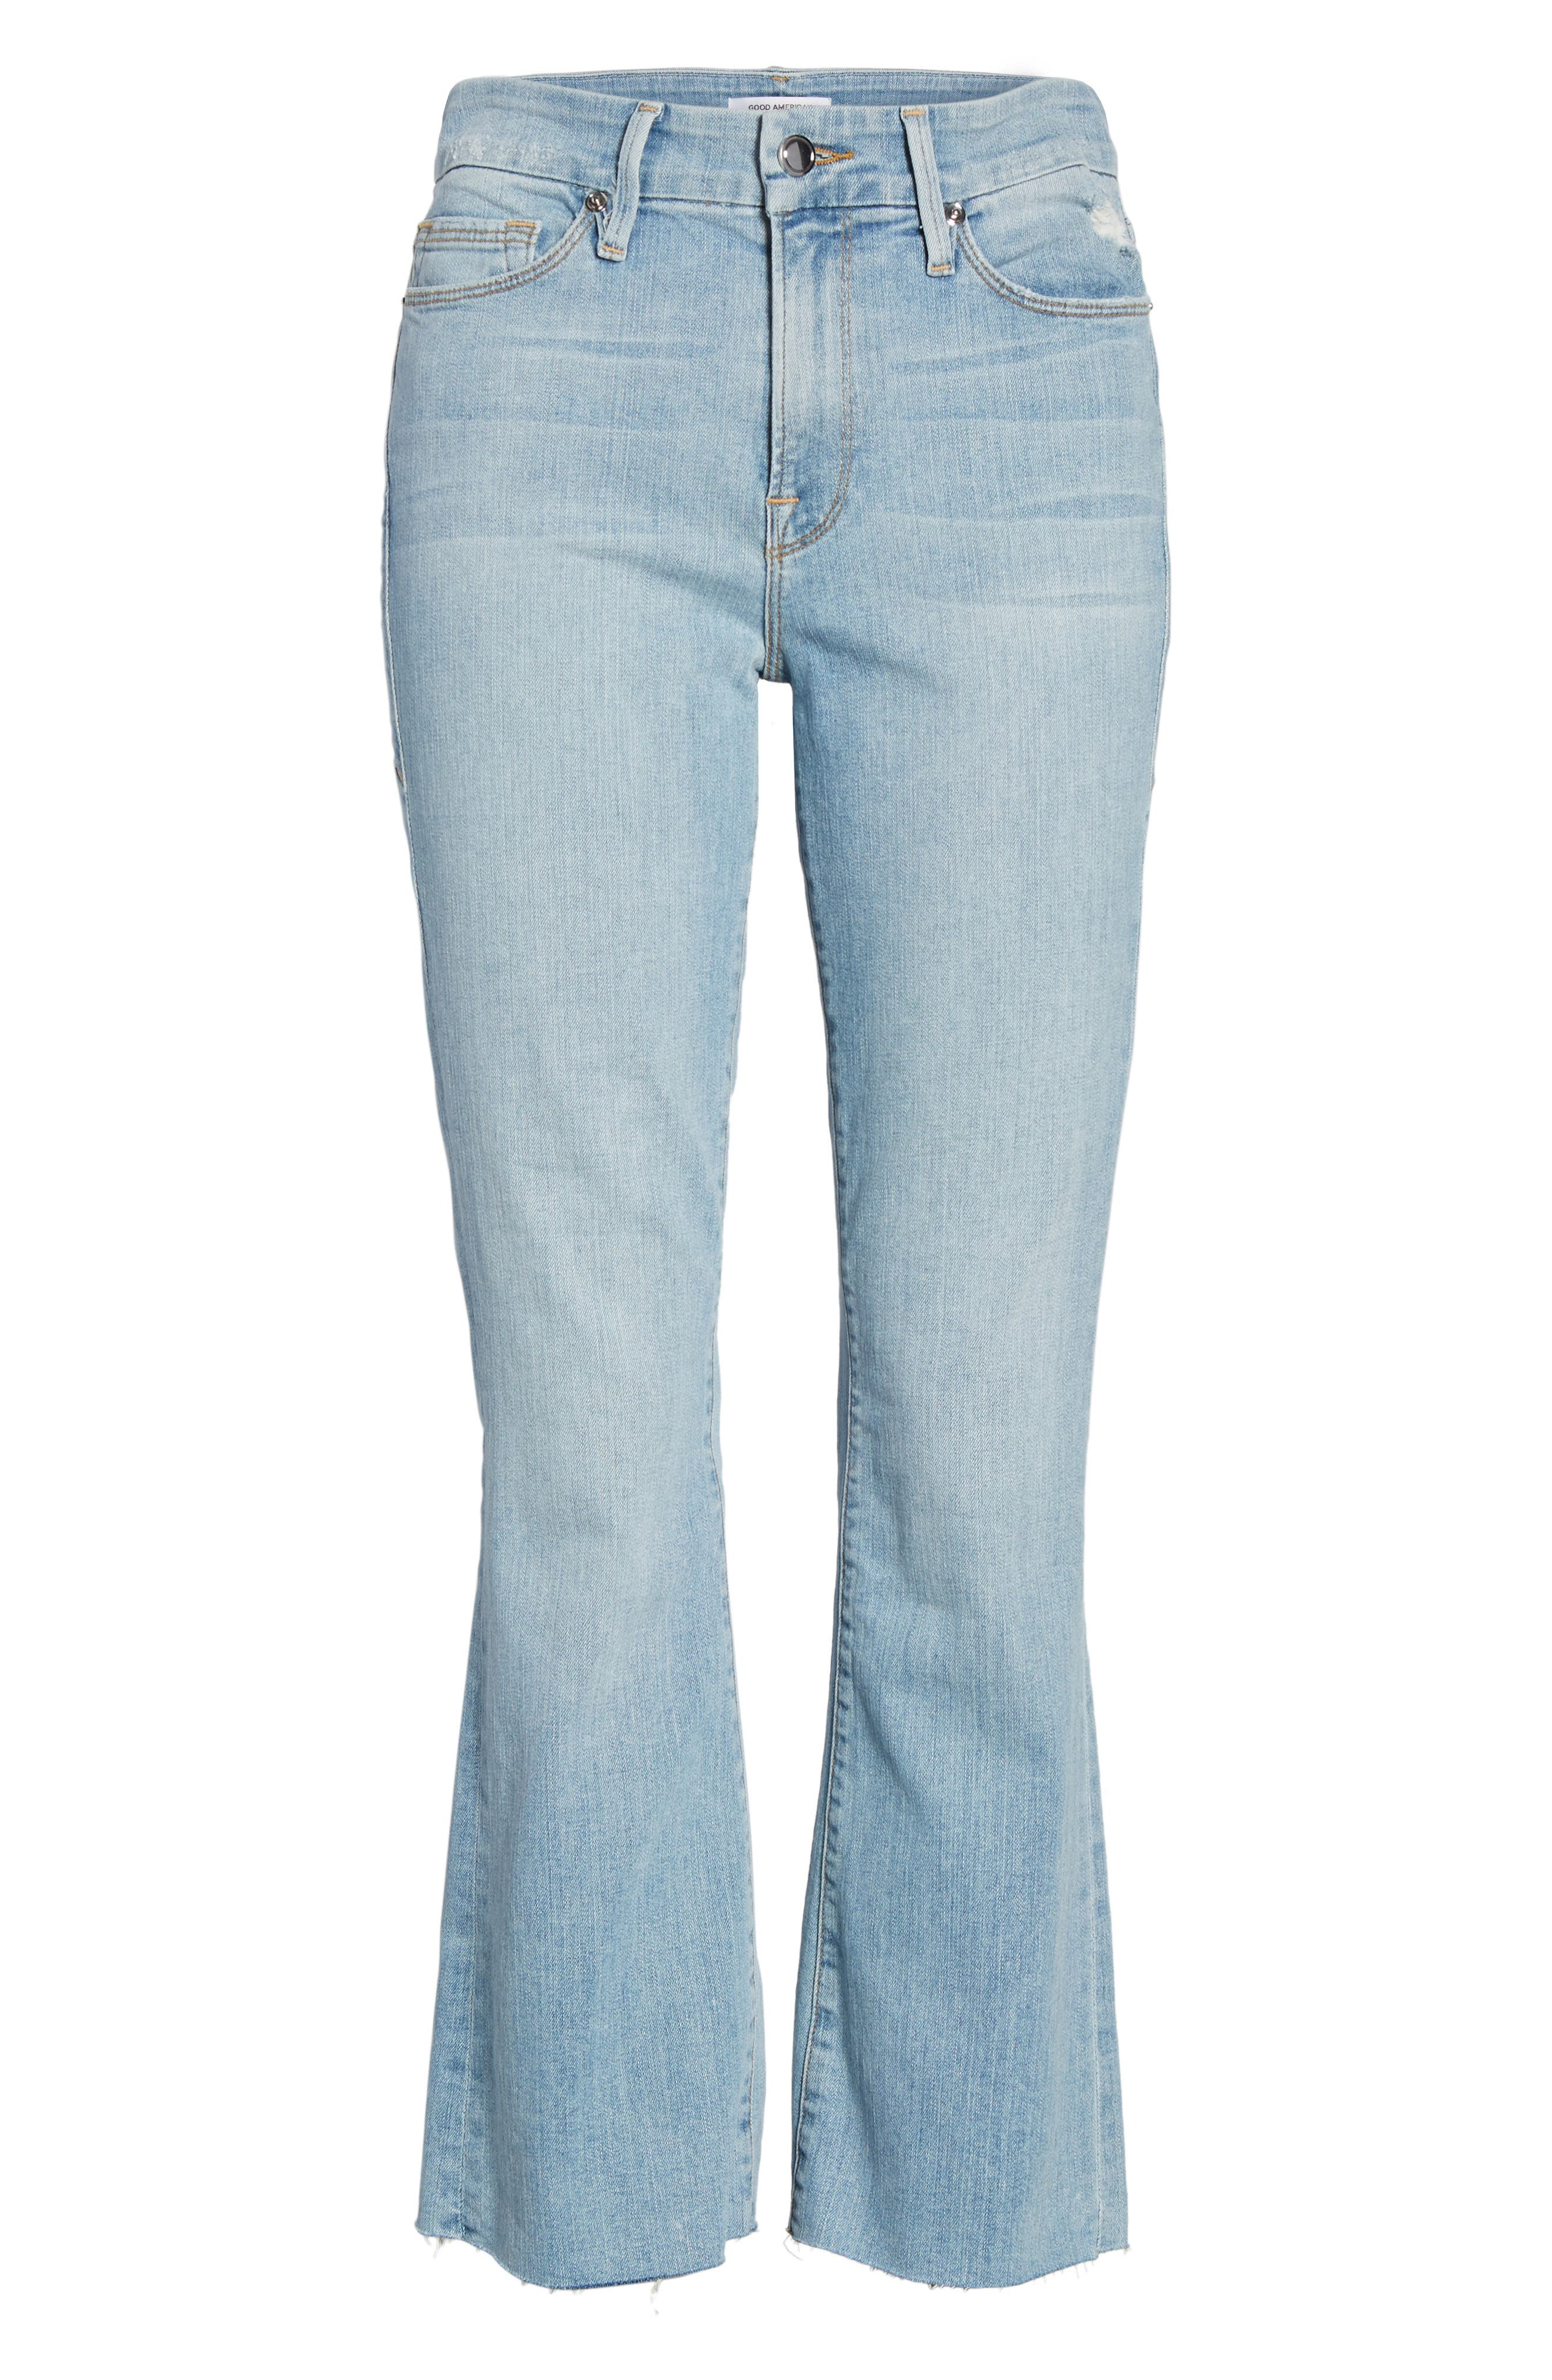 Crop Raw Edge Bootcut Jeans,                             Alternate thumbnail 6, color,                             402